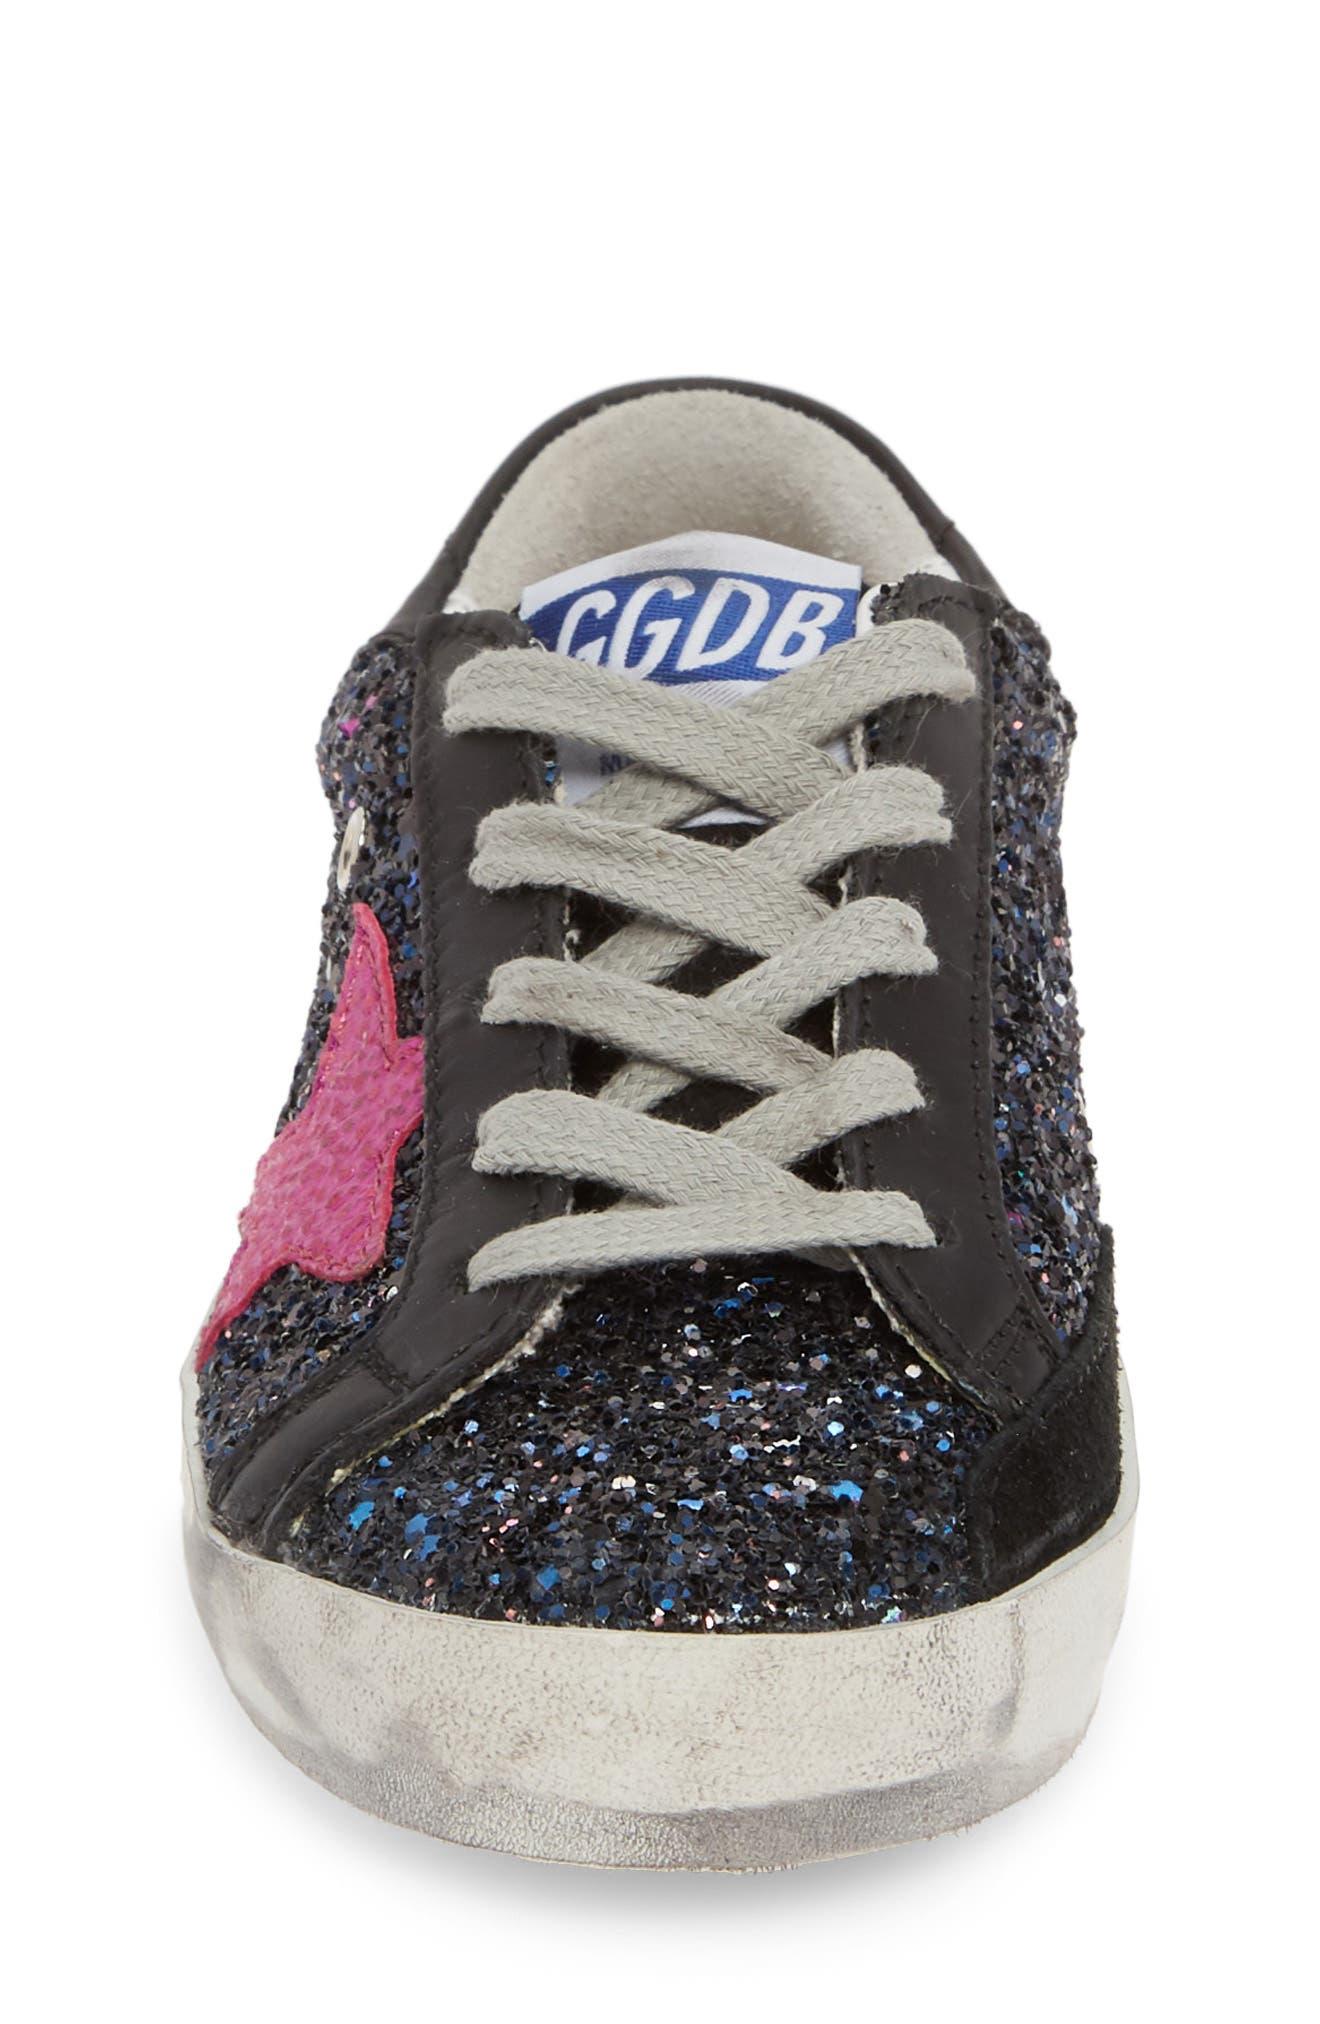 GOLDEN GOOSE,                             Superstar Glitter Low Top Sneaker,                             Alternate thumbnail 4, color,                             GALAXY GLITTER/ FUCHSIA STAR